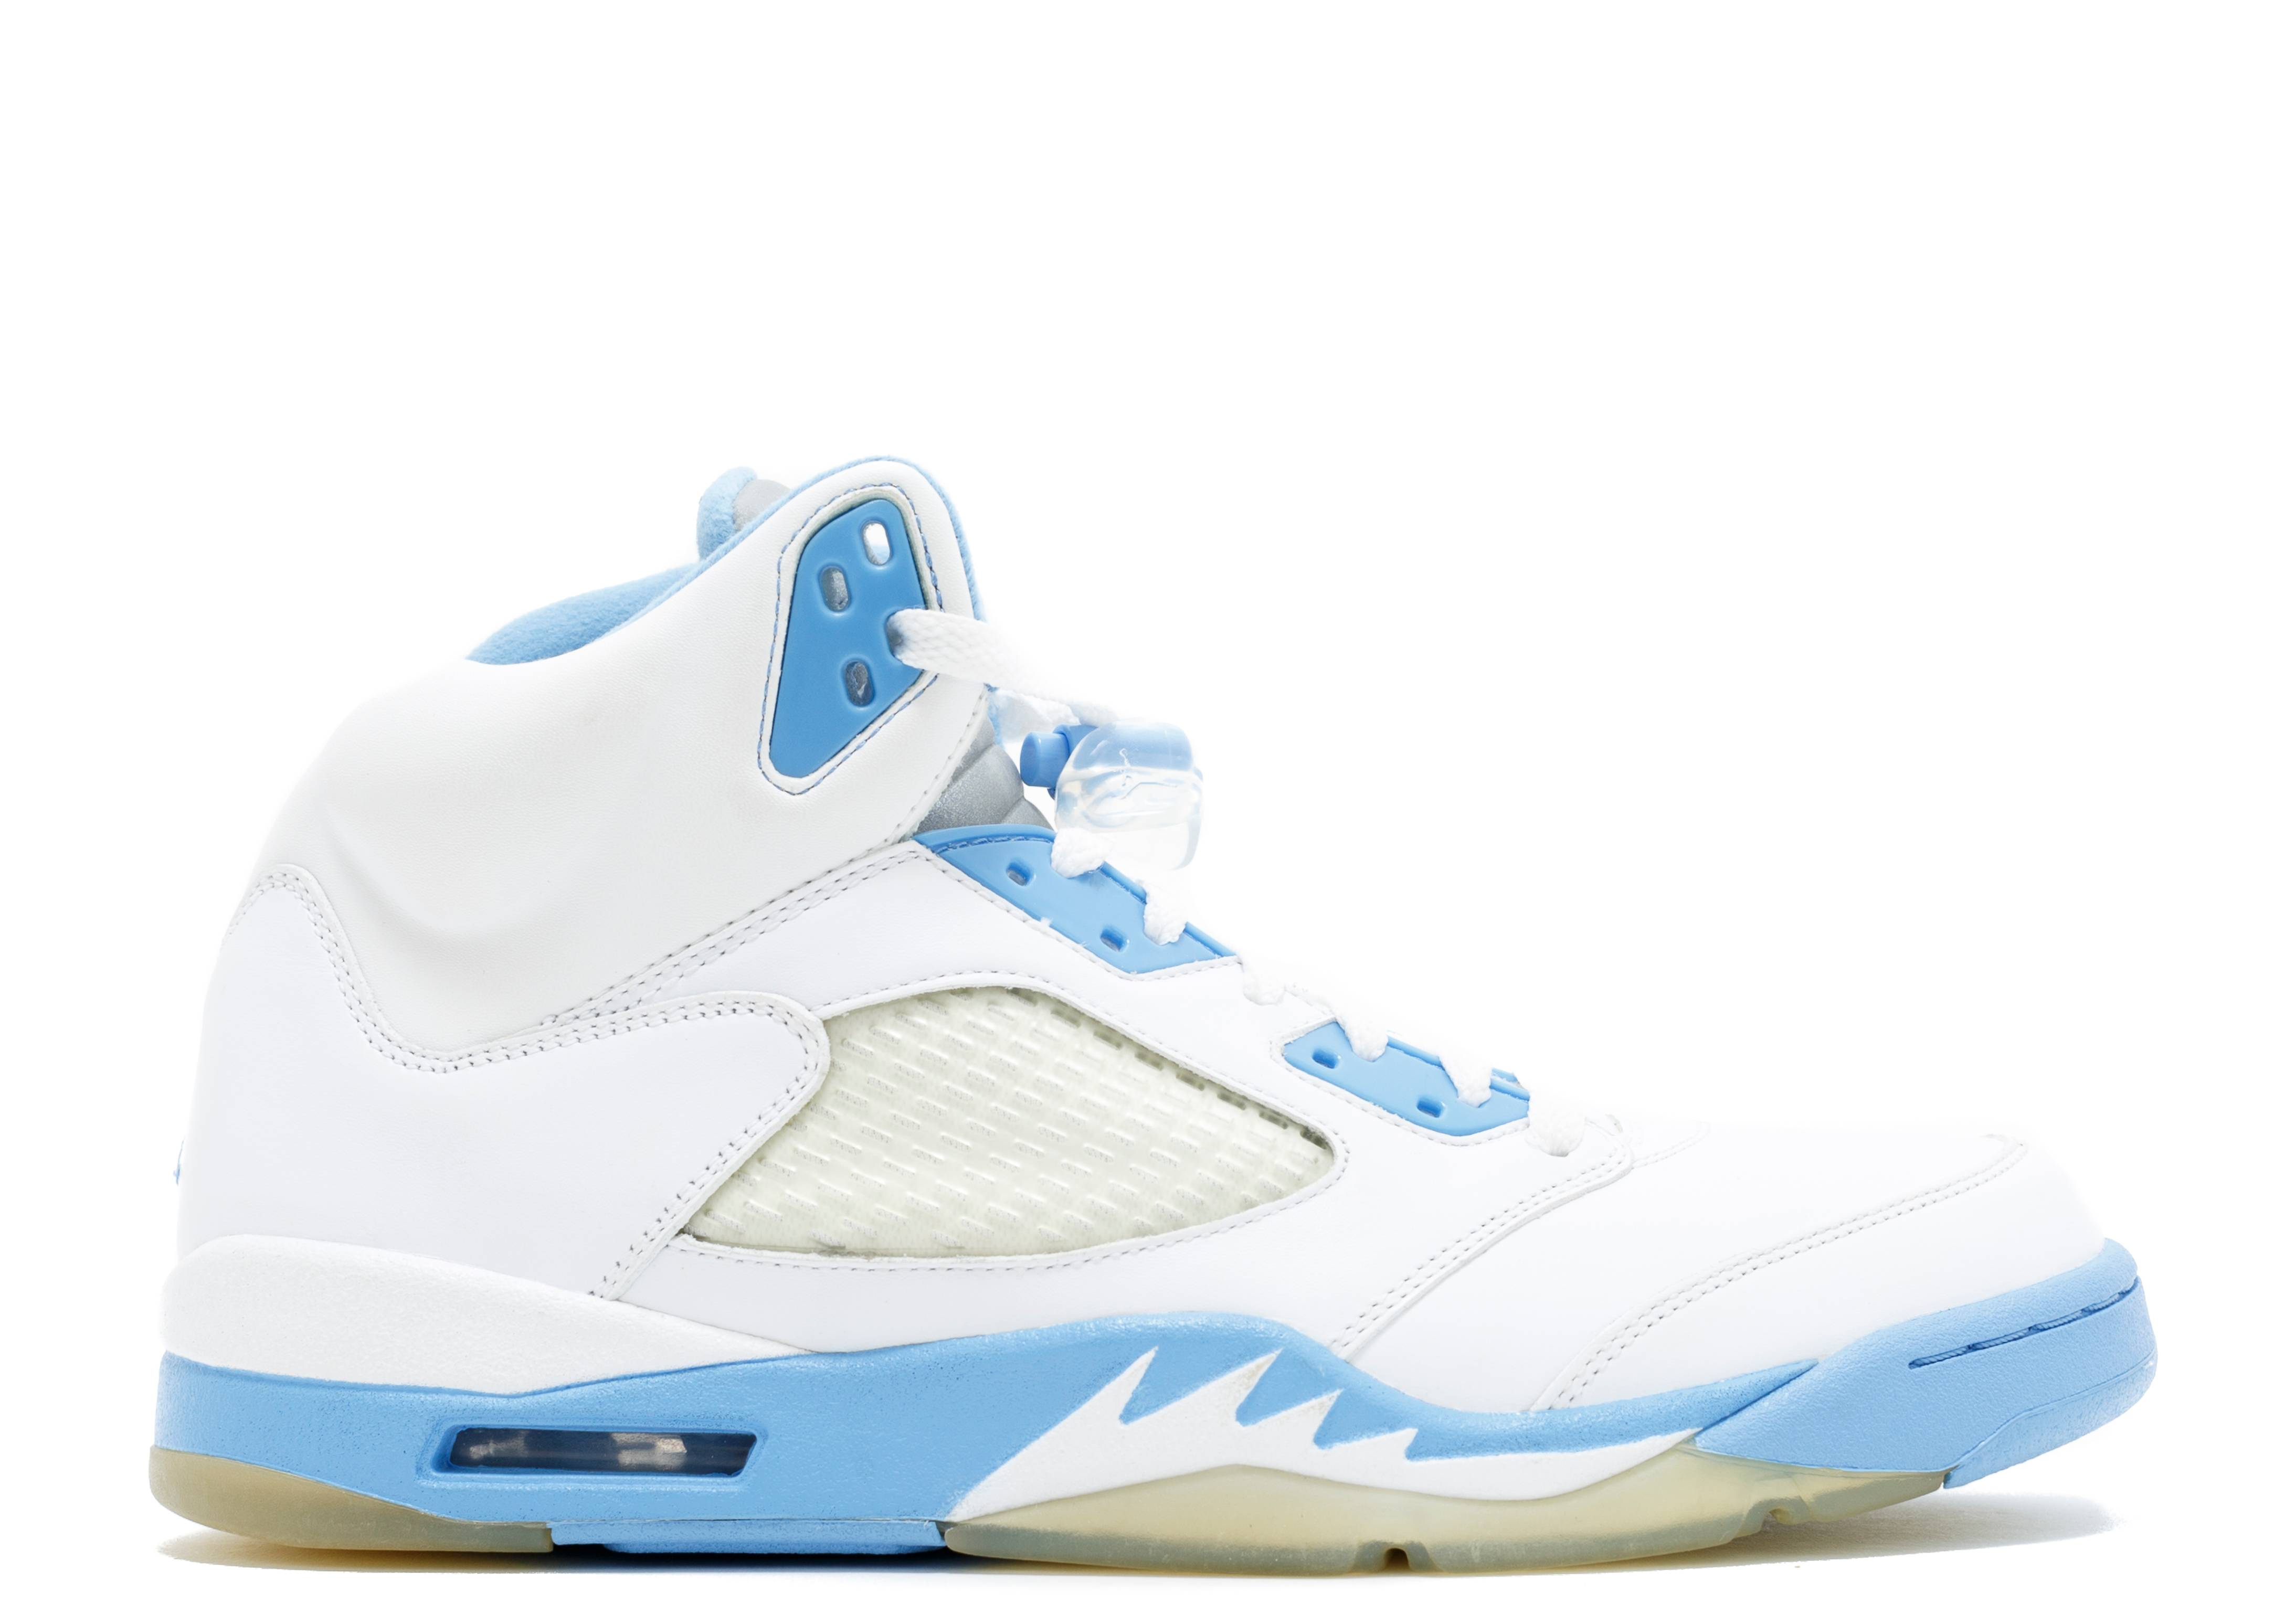 Air Jordan 5 Retro Motorsports White University Blue